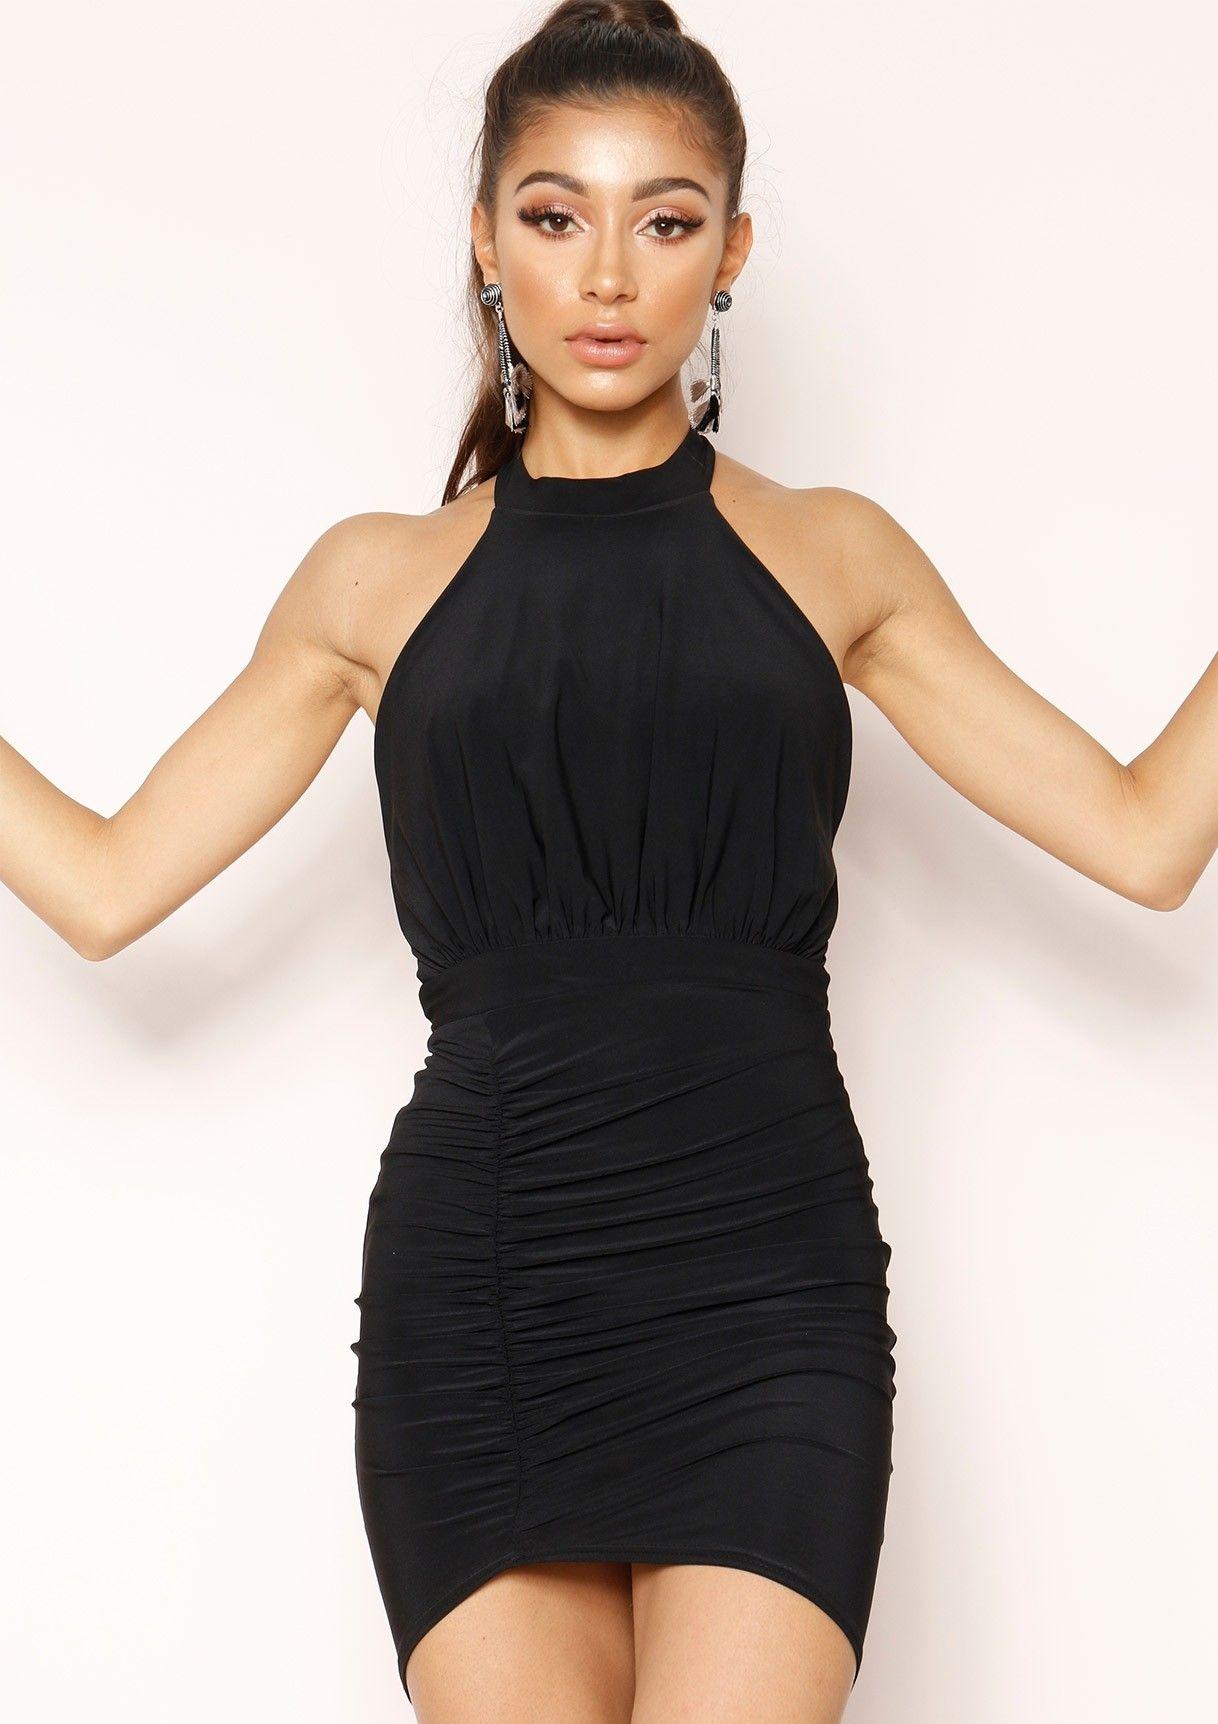 044cf94f78 Missyempire - Serin Black Slinky Ruched Bodycon Dress